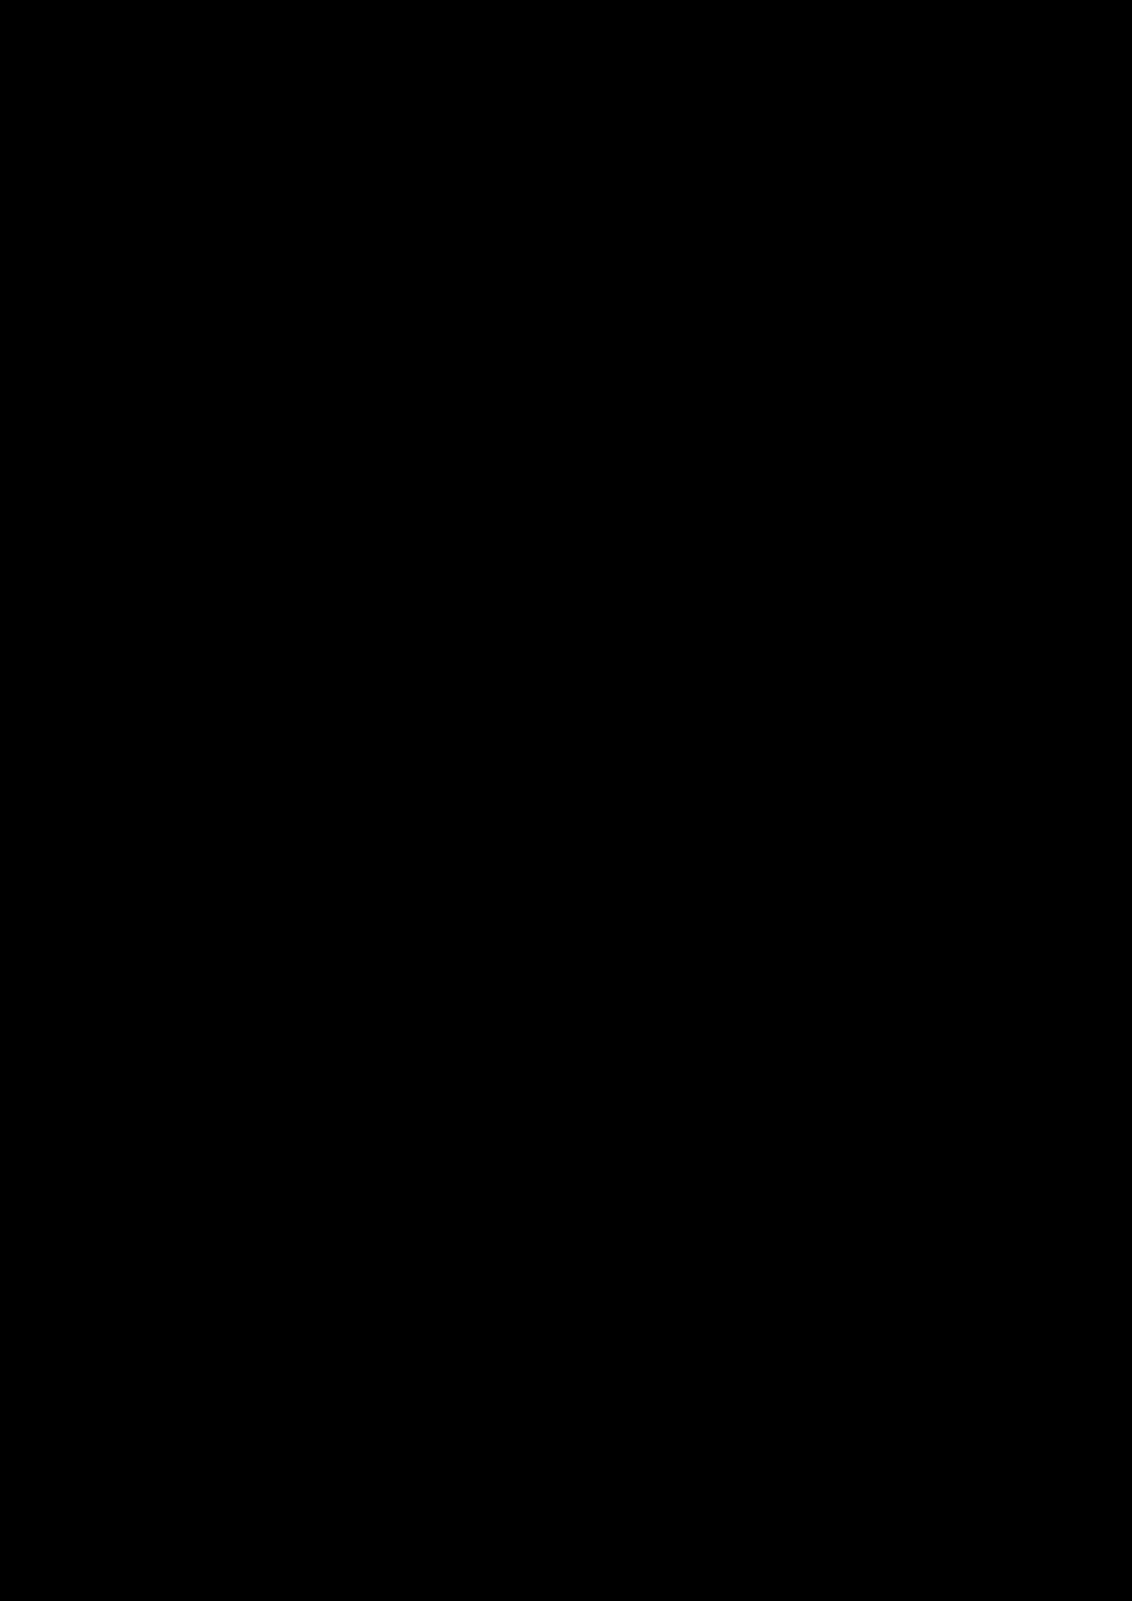 Okean Pustotyi slide, Image 59